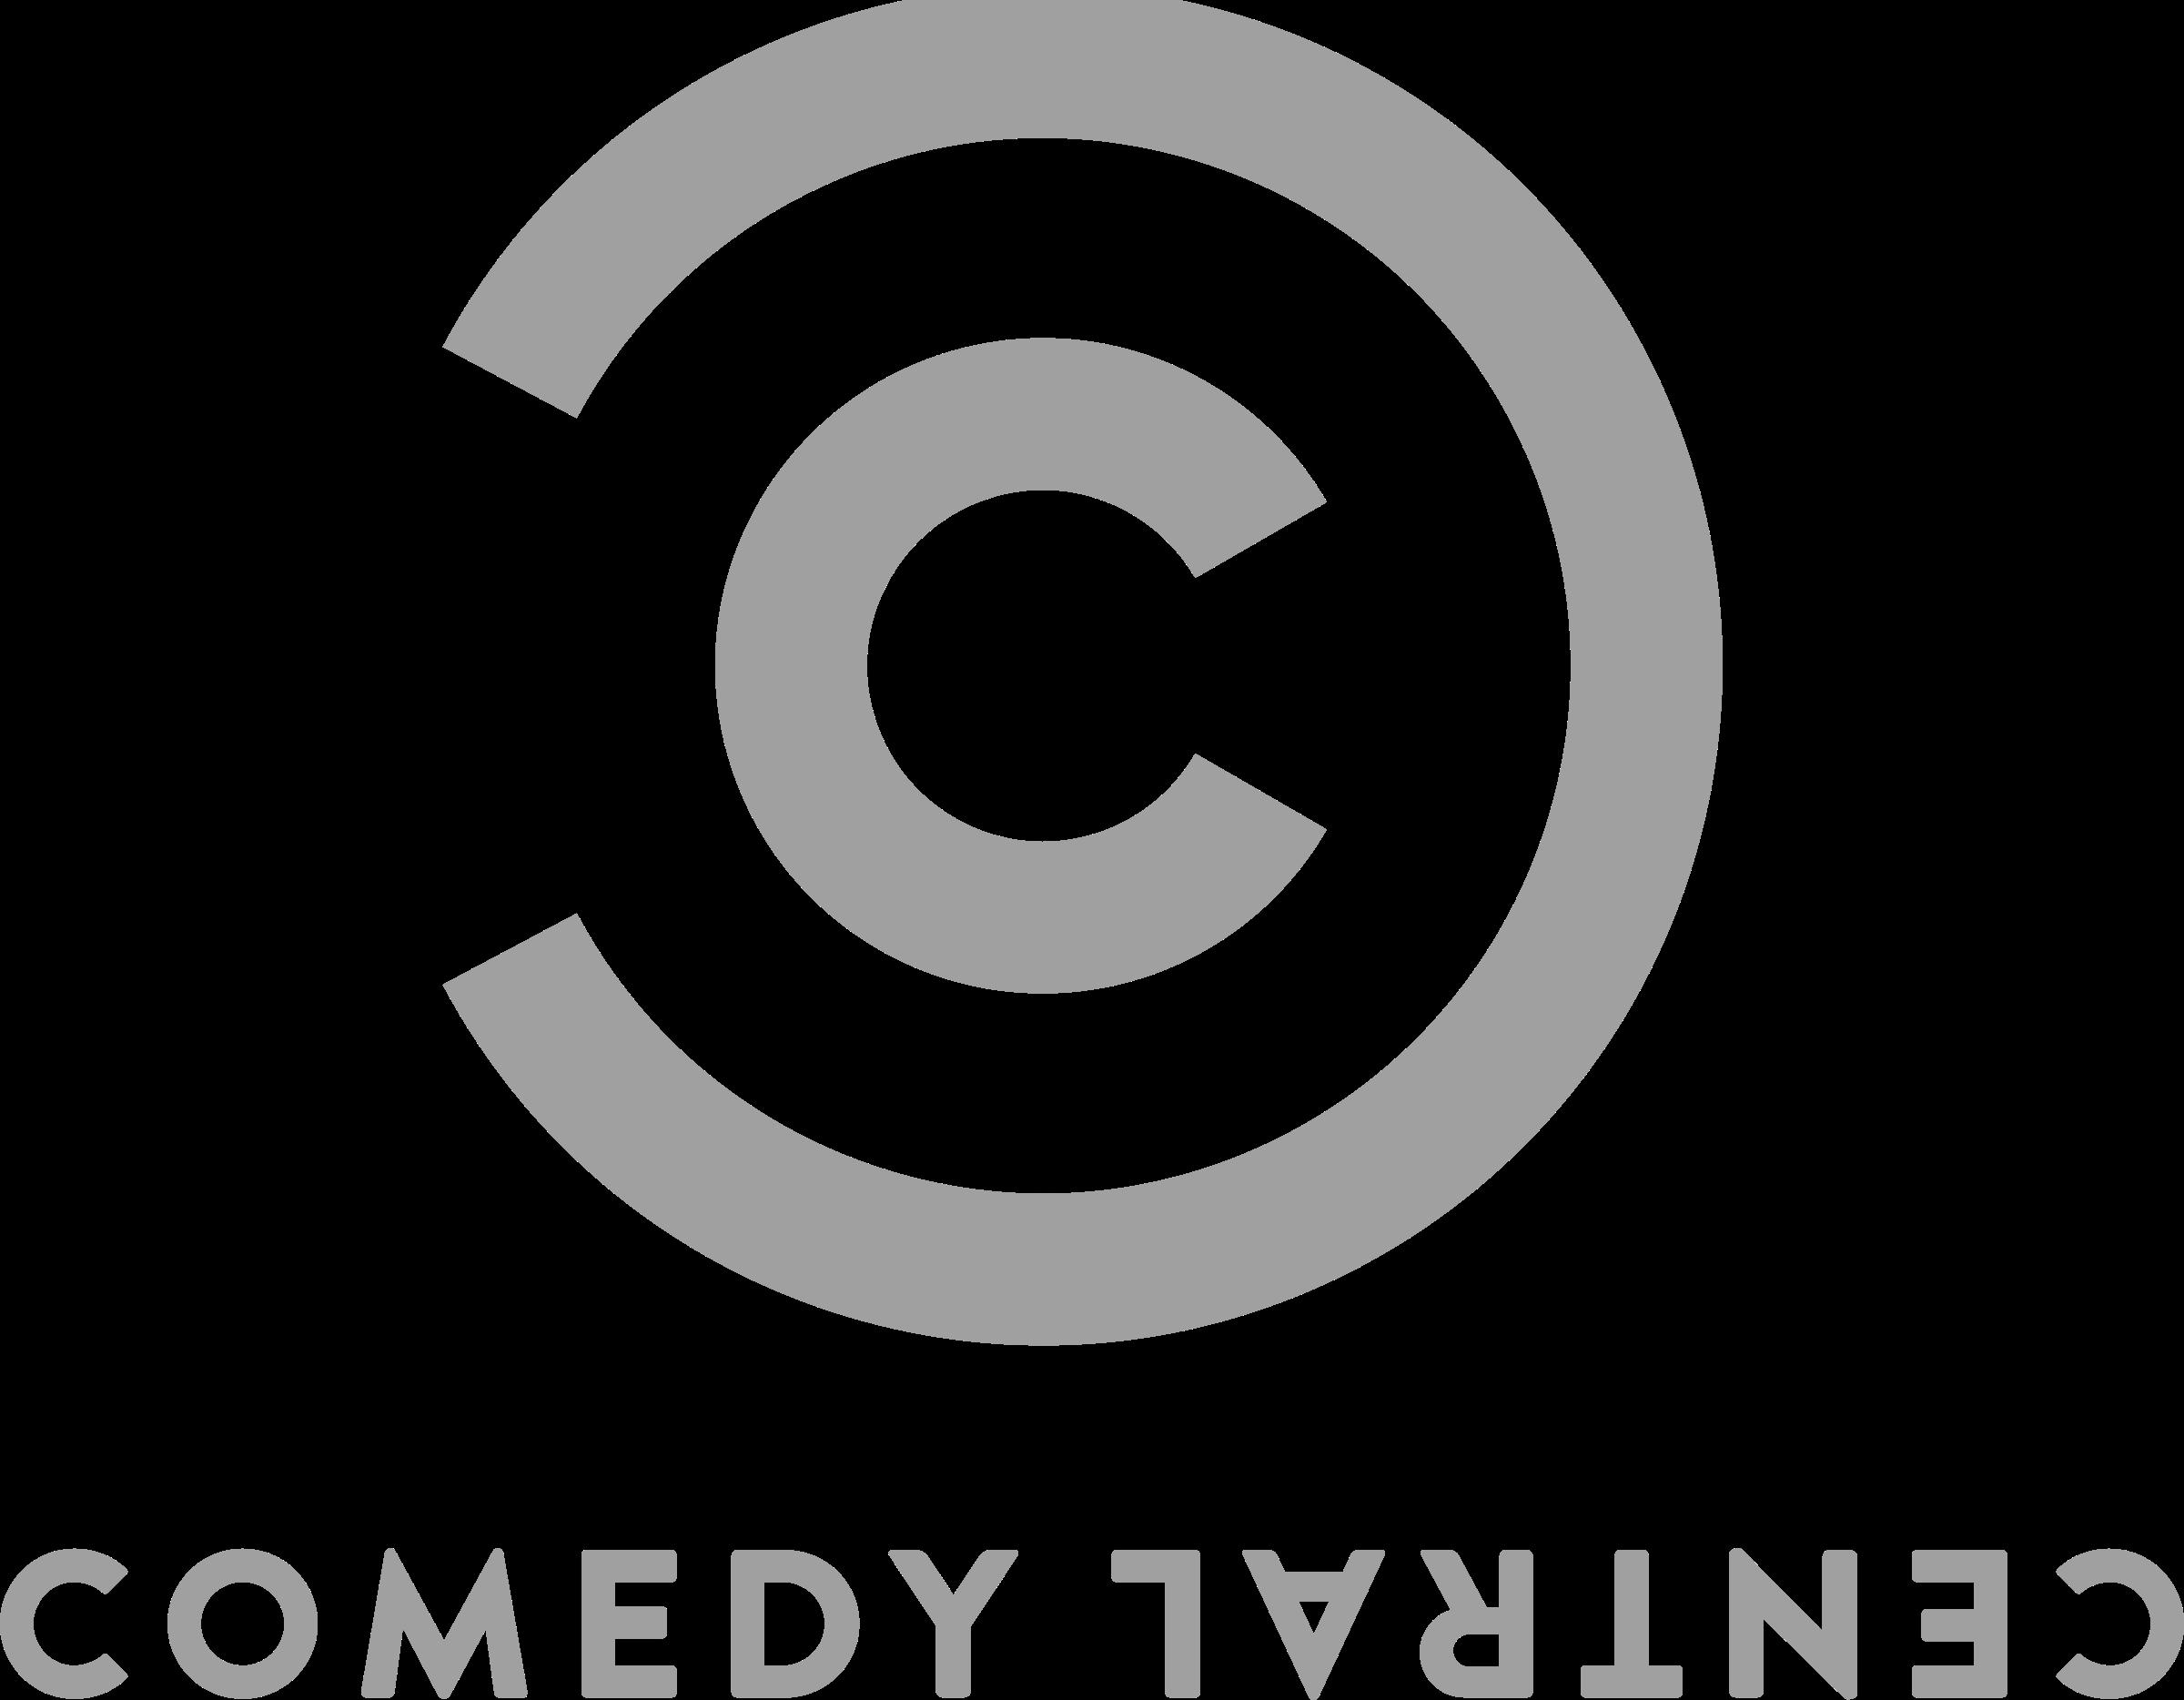 comedy-central-4-logo-png-transparent.png